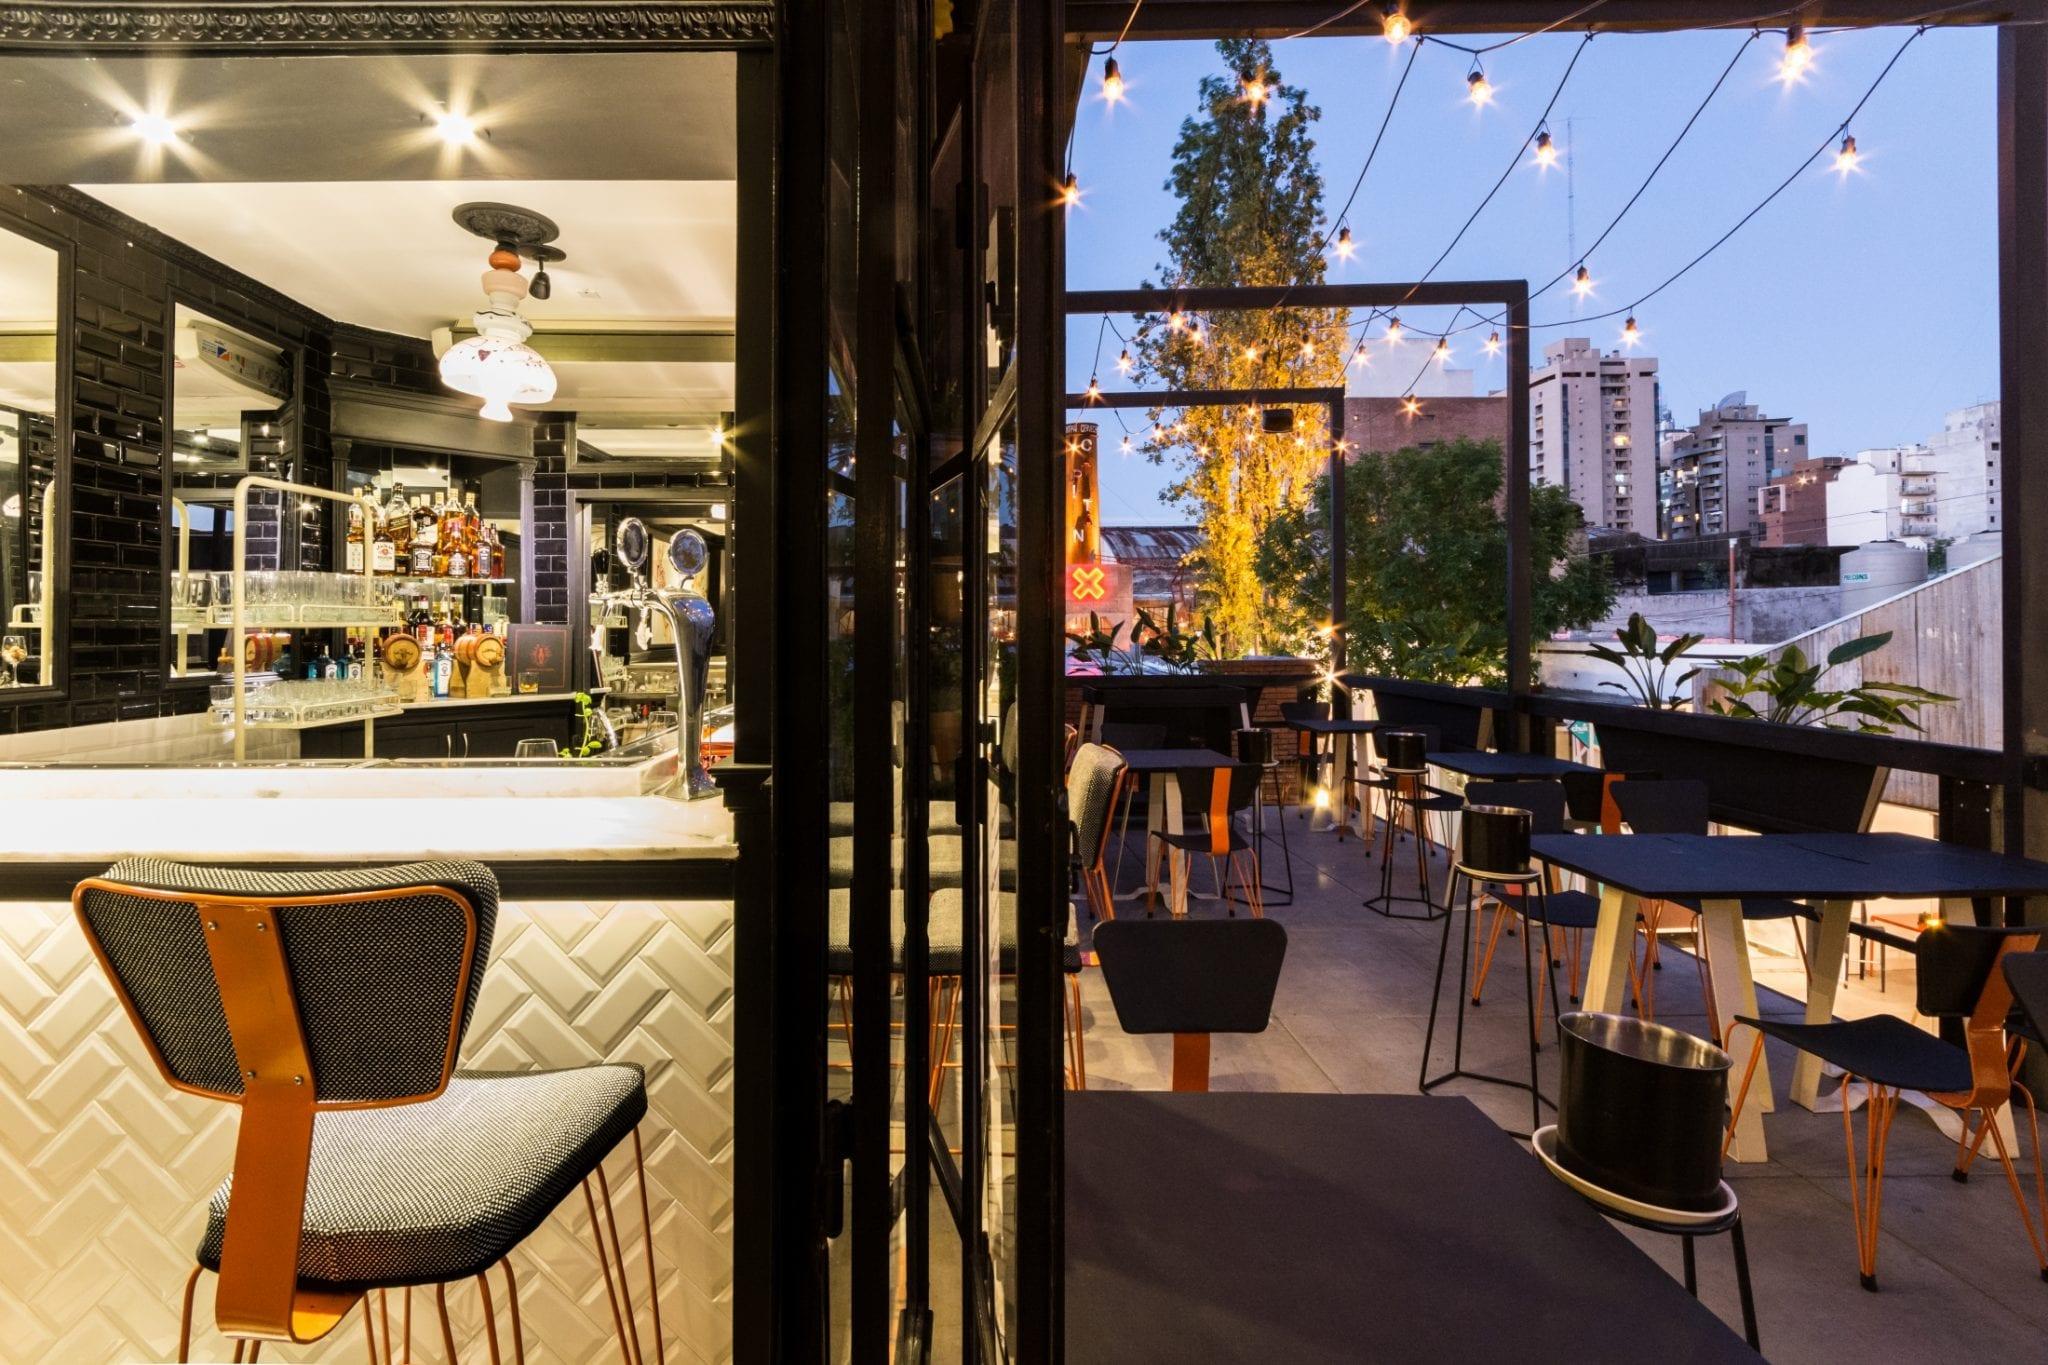 090317  -  Gordo Restoran ph G Viramonte-4401